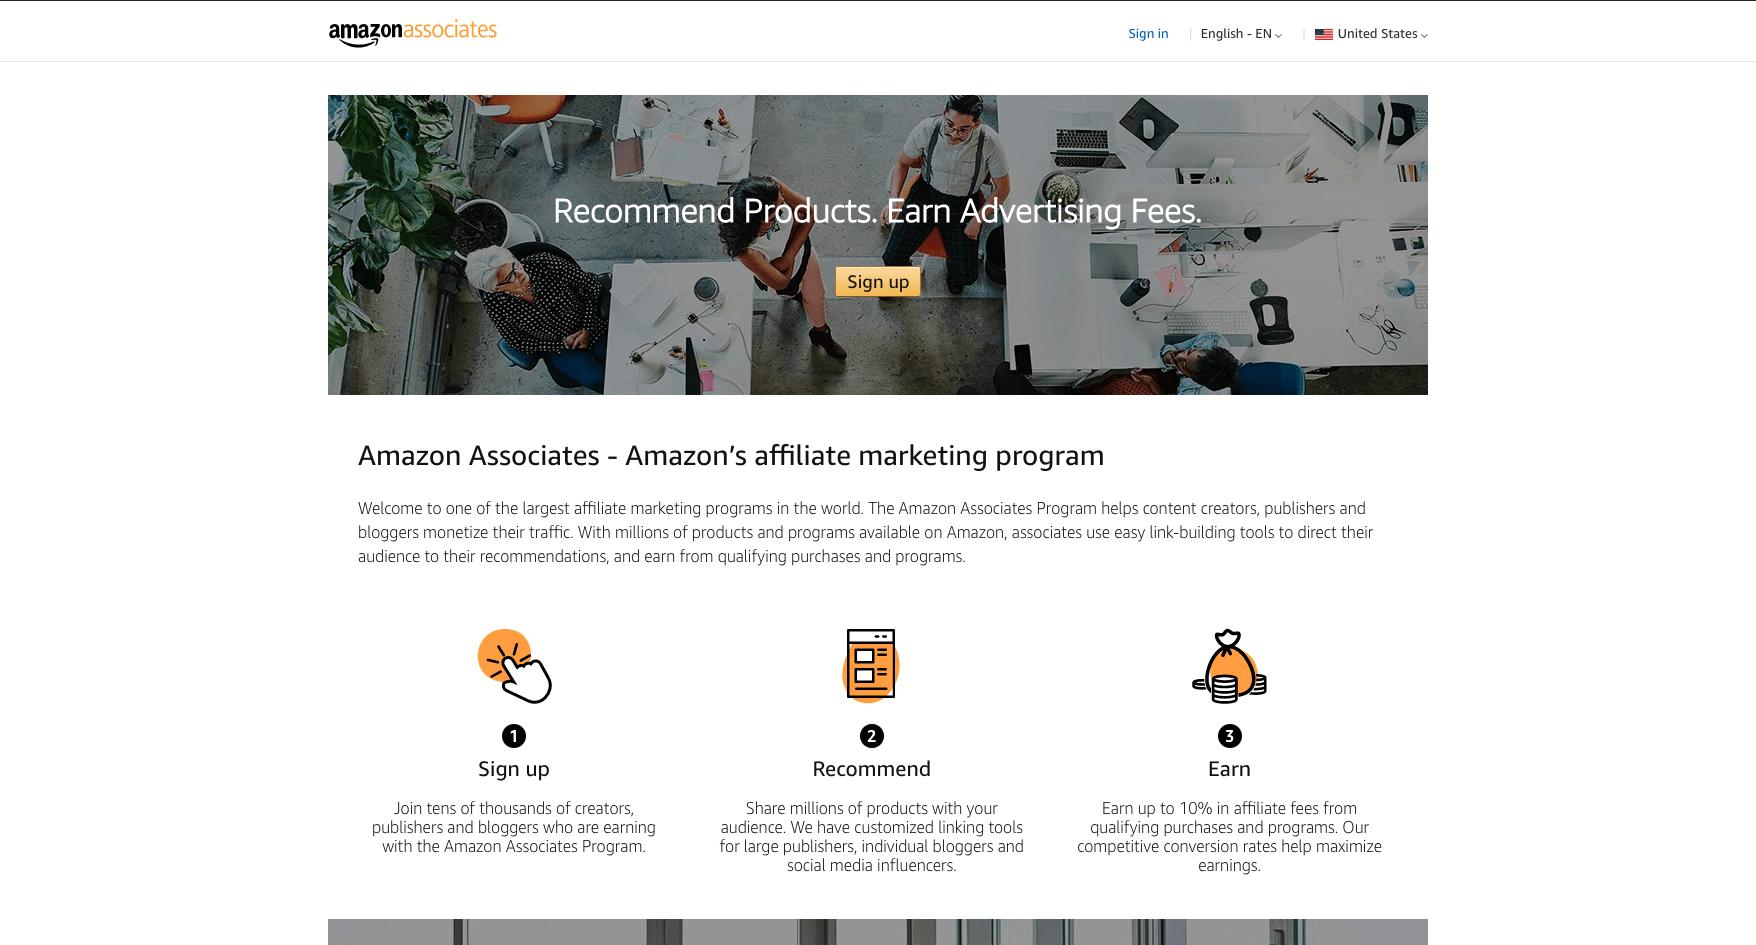 Amazon Affiliates homepage